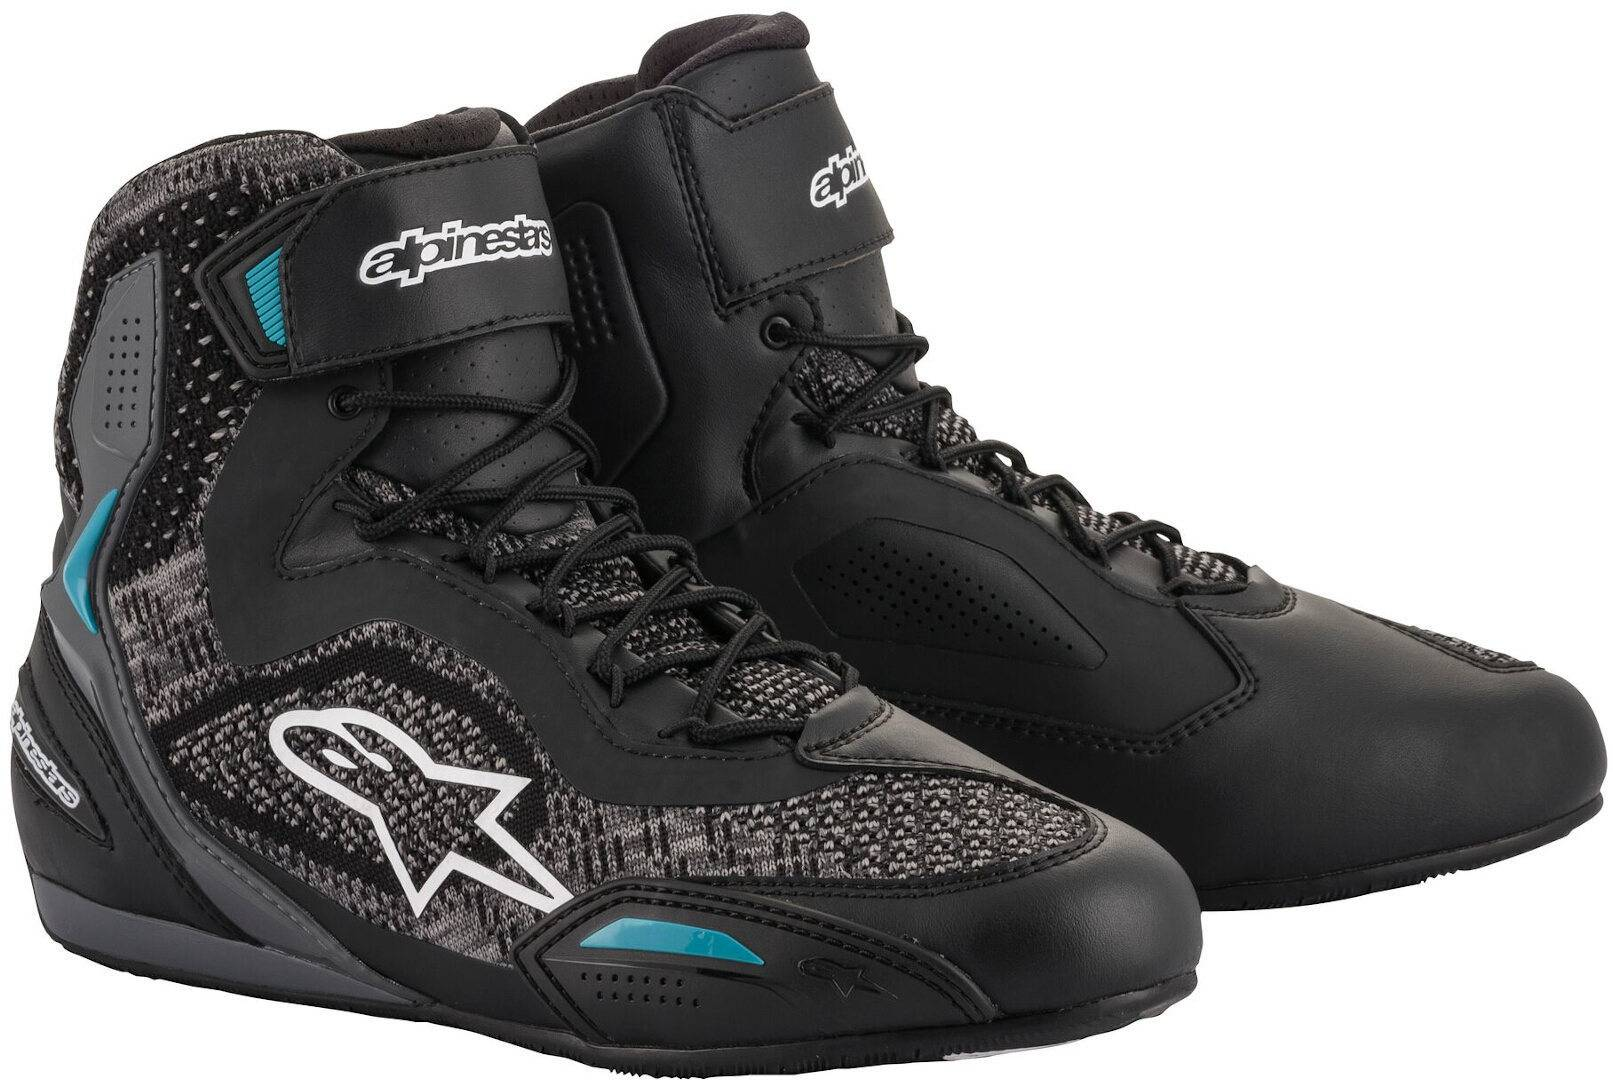 Alpinestars Stella Faster-3 Rideknit Ladies Motorcycle Shoes Black White Blue 38 39